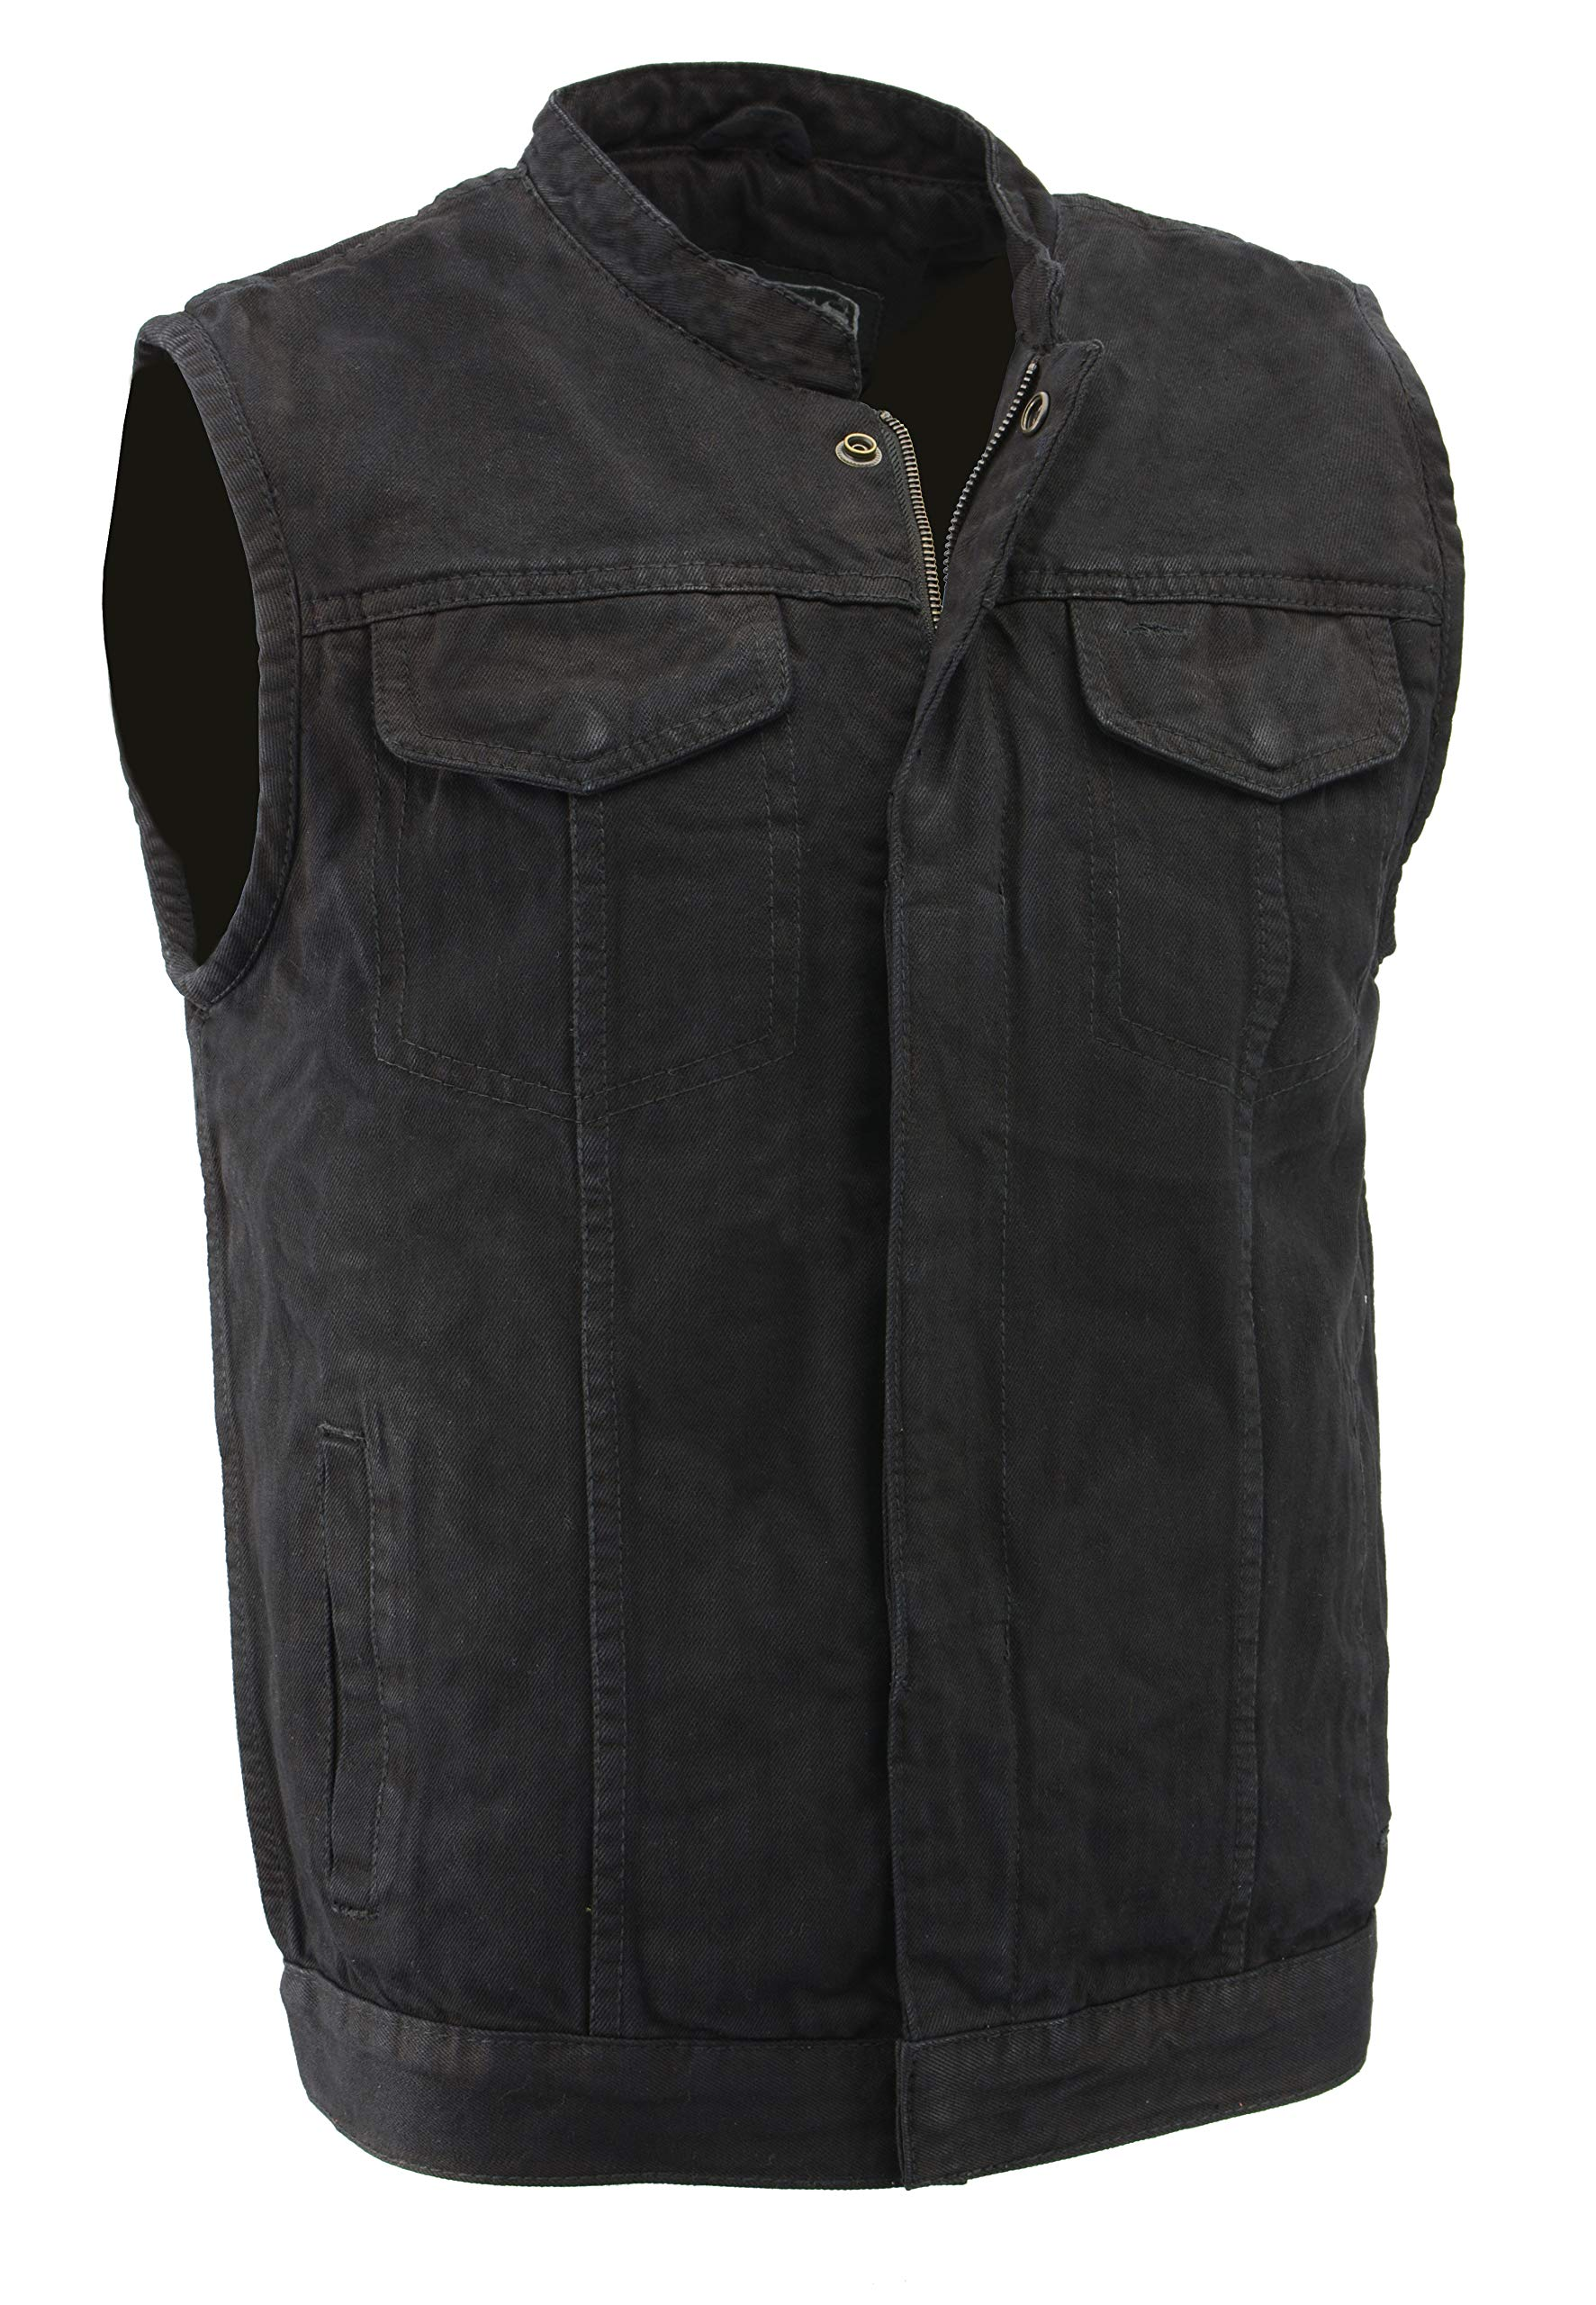 M-Boss Motorcycle Apparel-BOS13000-BLACK-Men's Denim Club Style Vest w/Hidden Zipper-BLACK-2XL